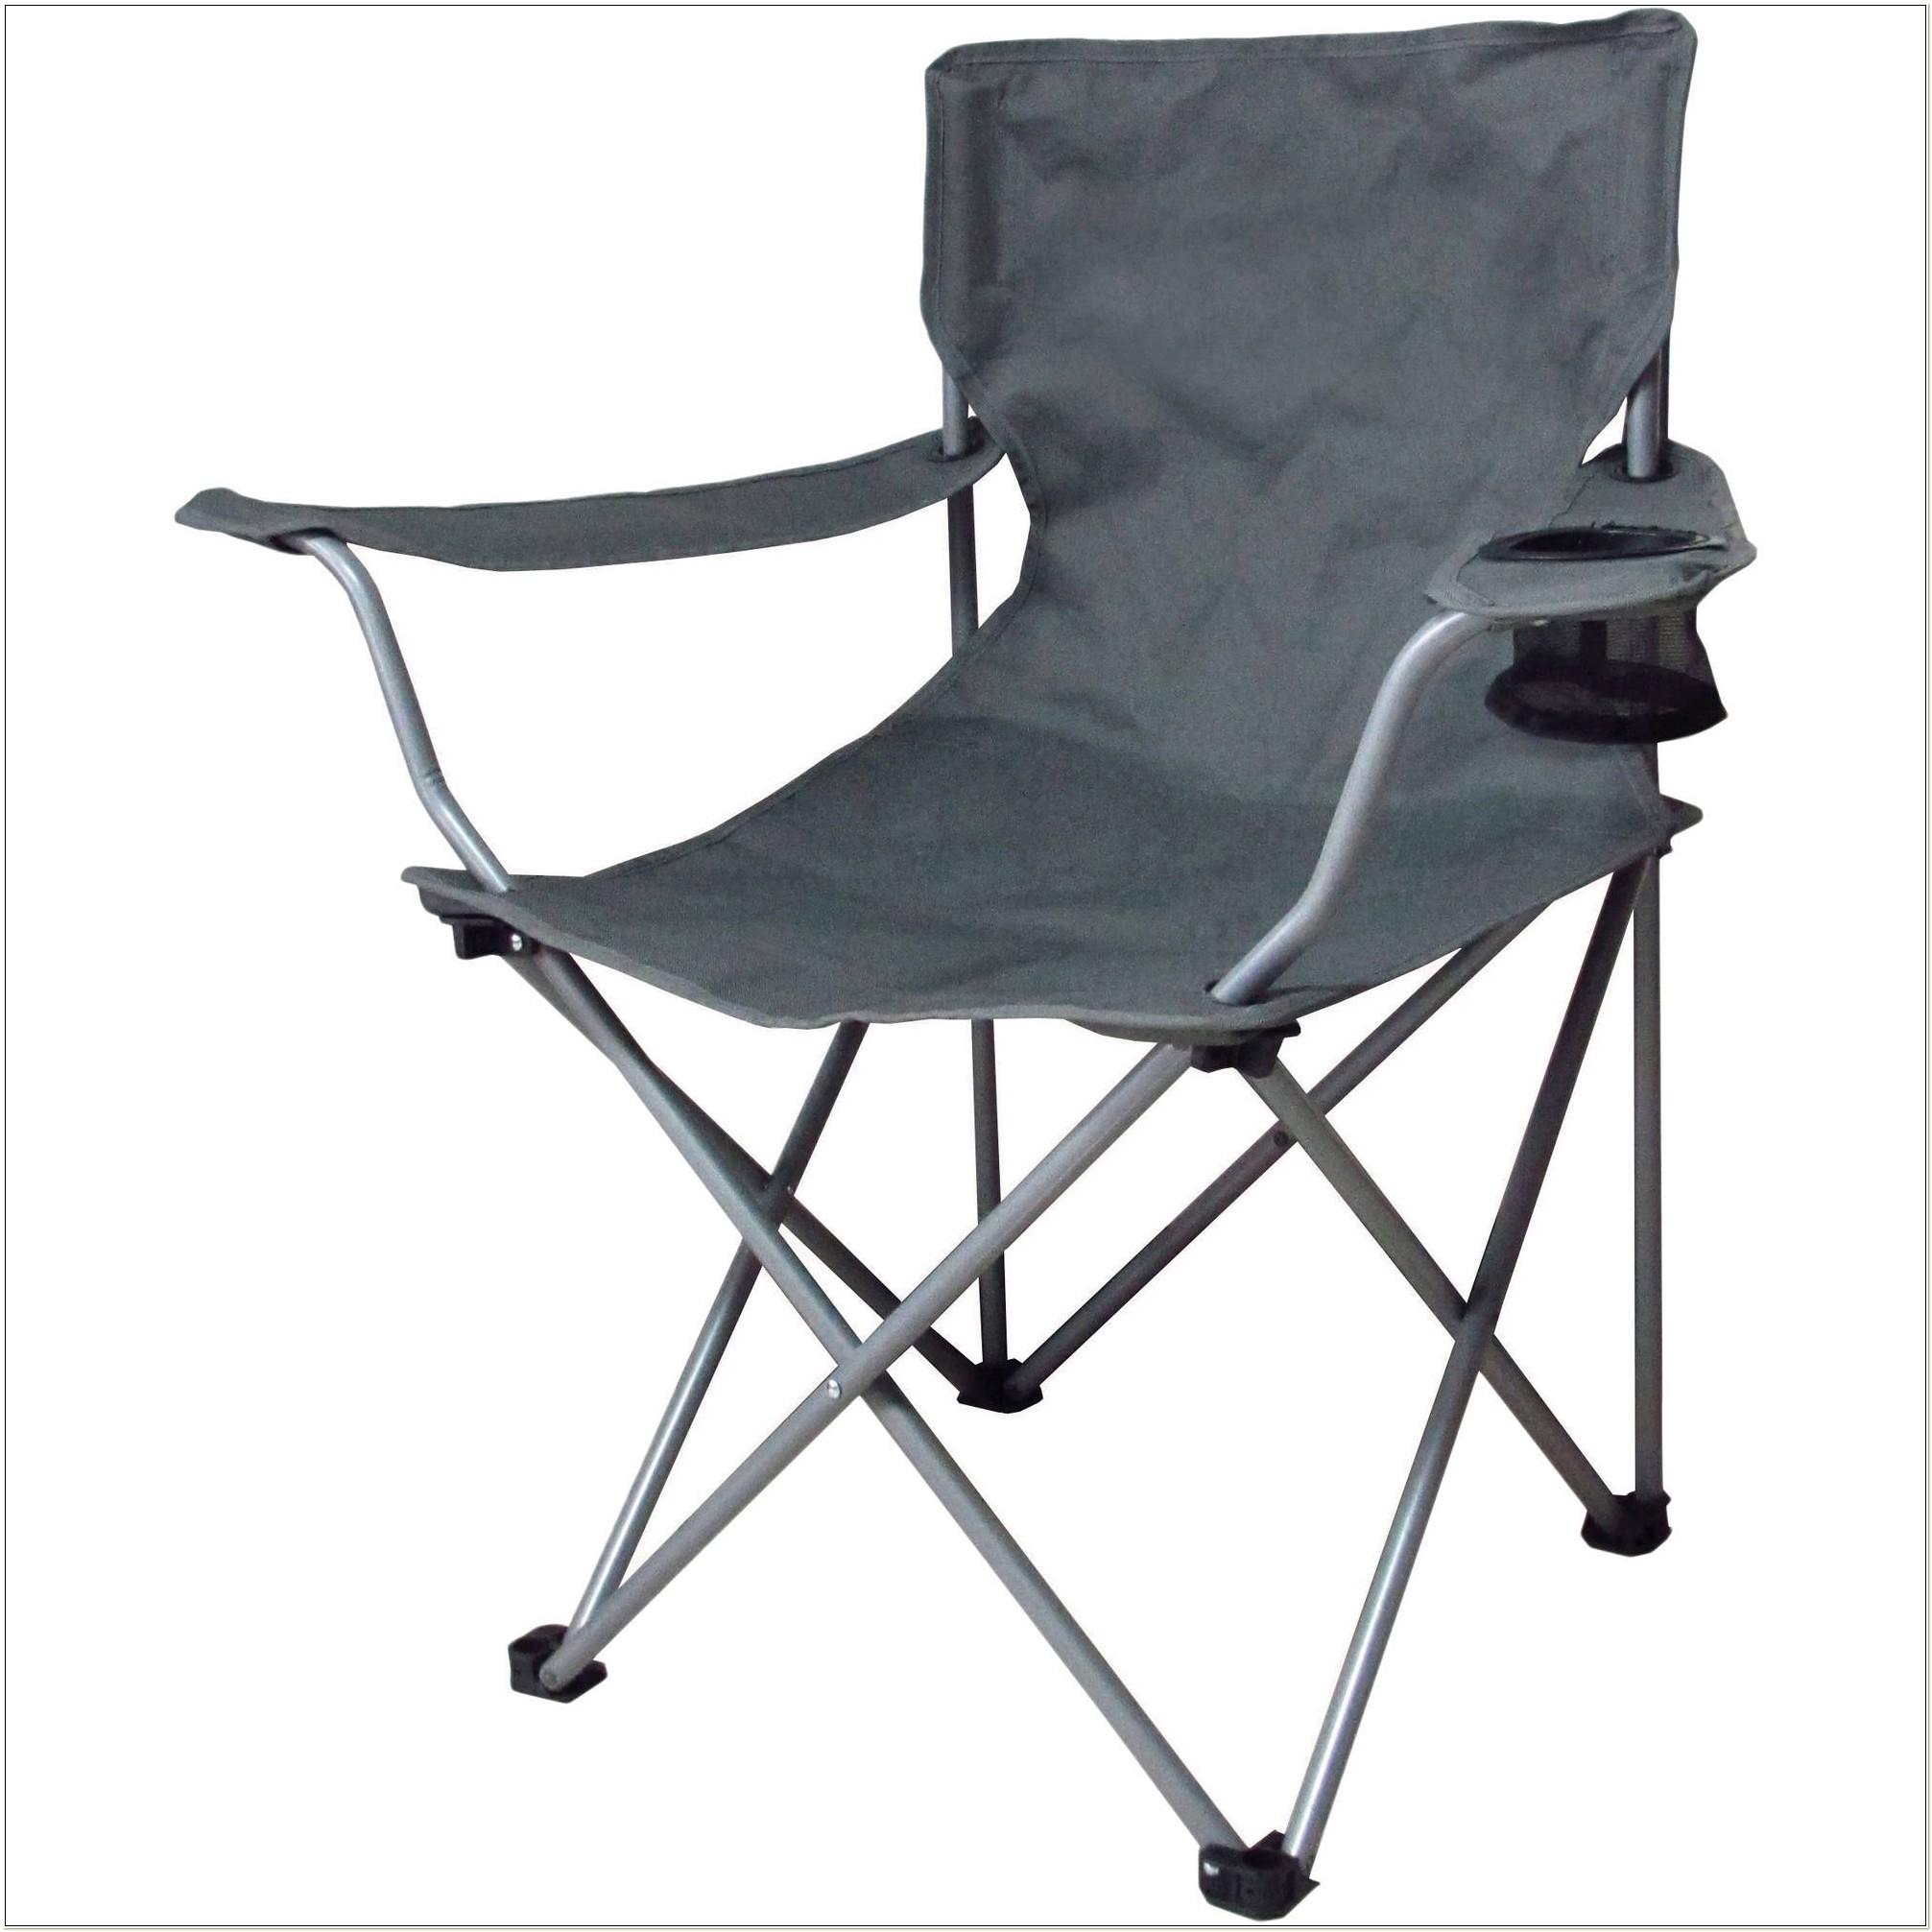 Fold Up Camping Chairs Walmart